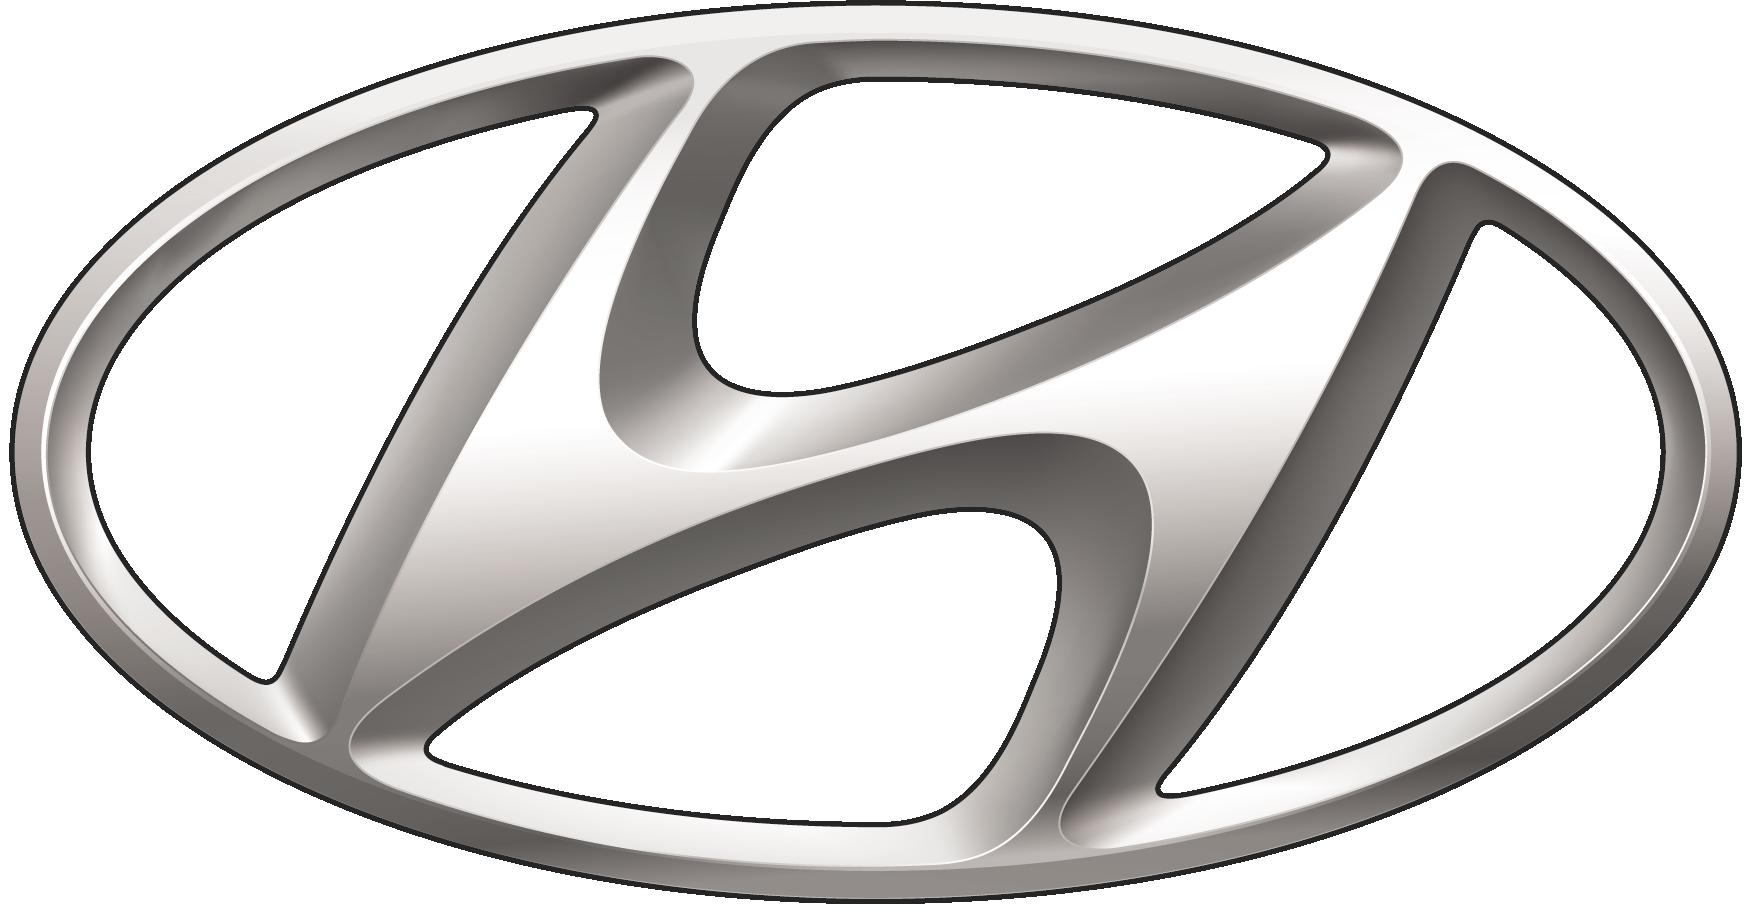 Хюндай PNG фото логотип, Hyundai car logo PNG